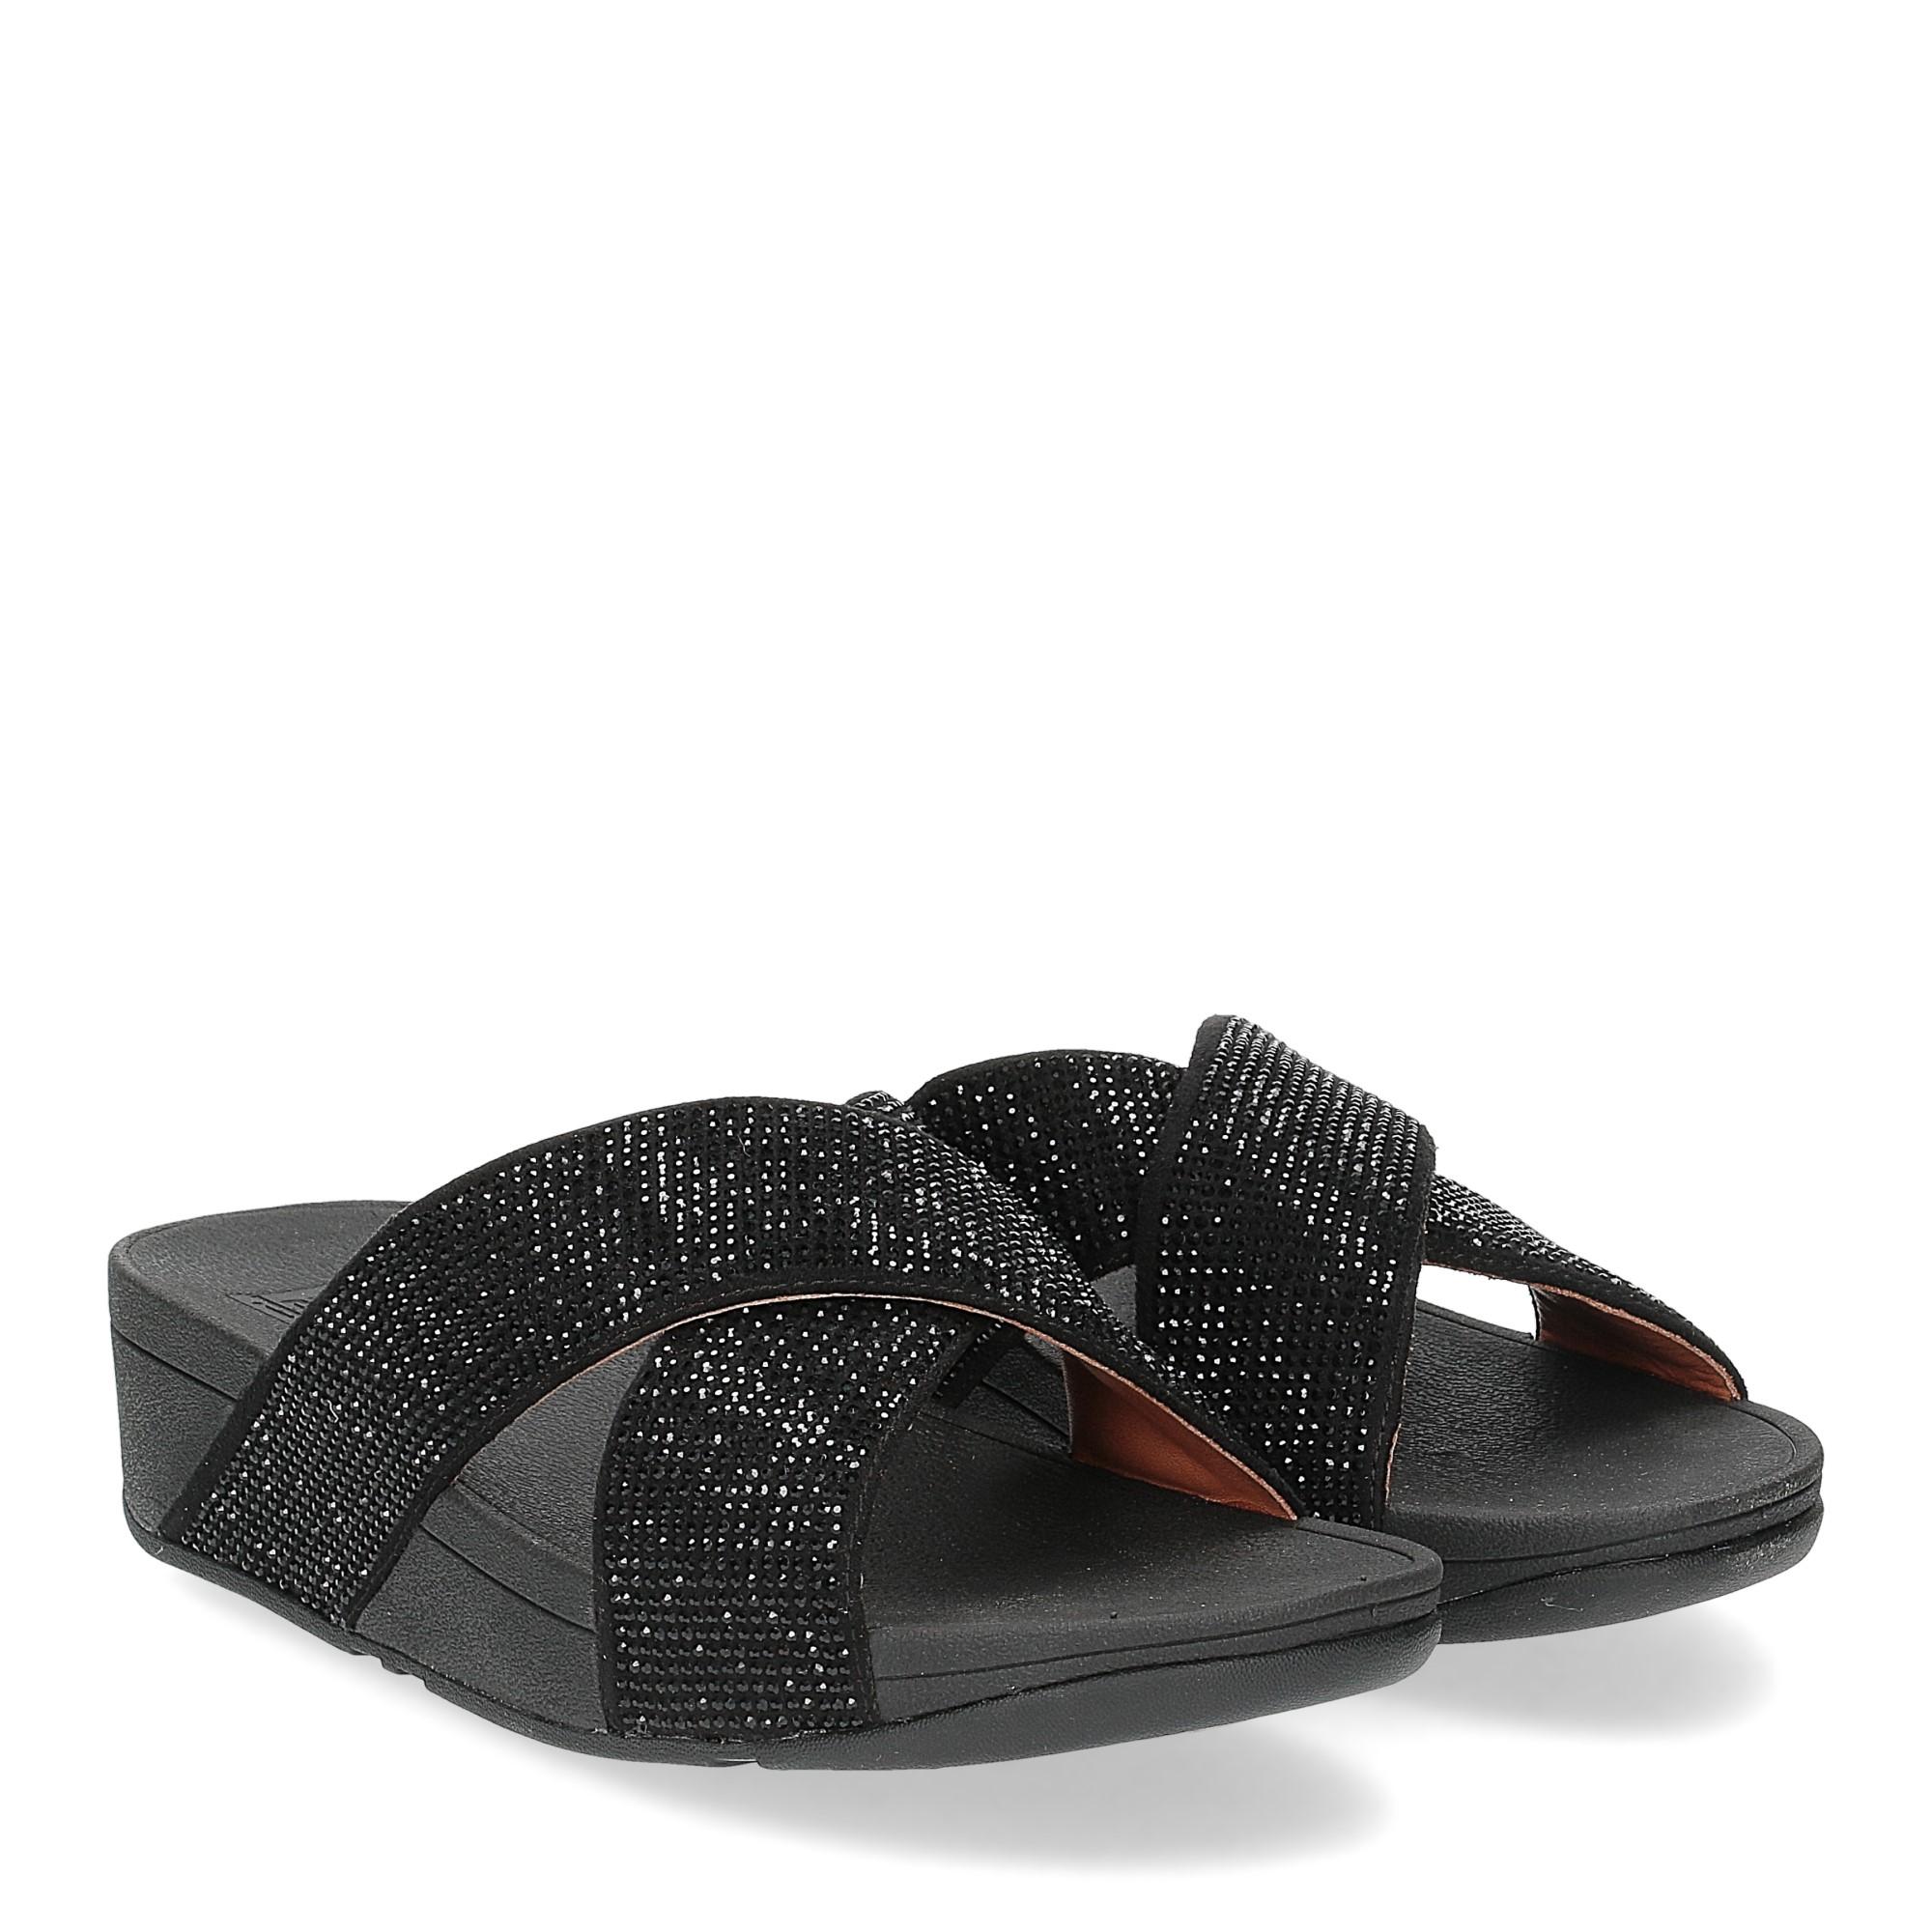 Fitflop Ritzy Slide Sandals black